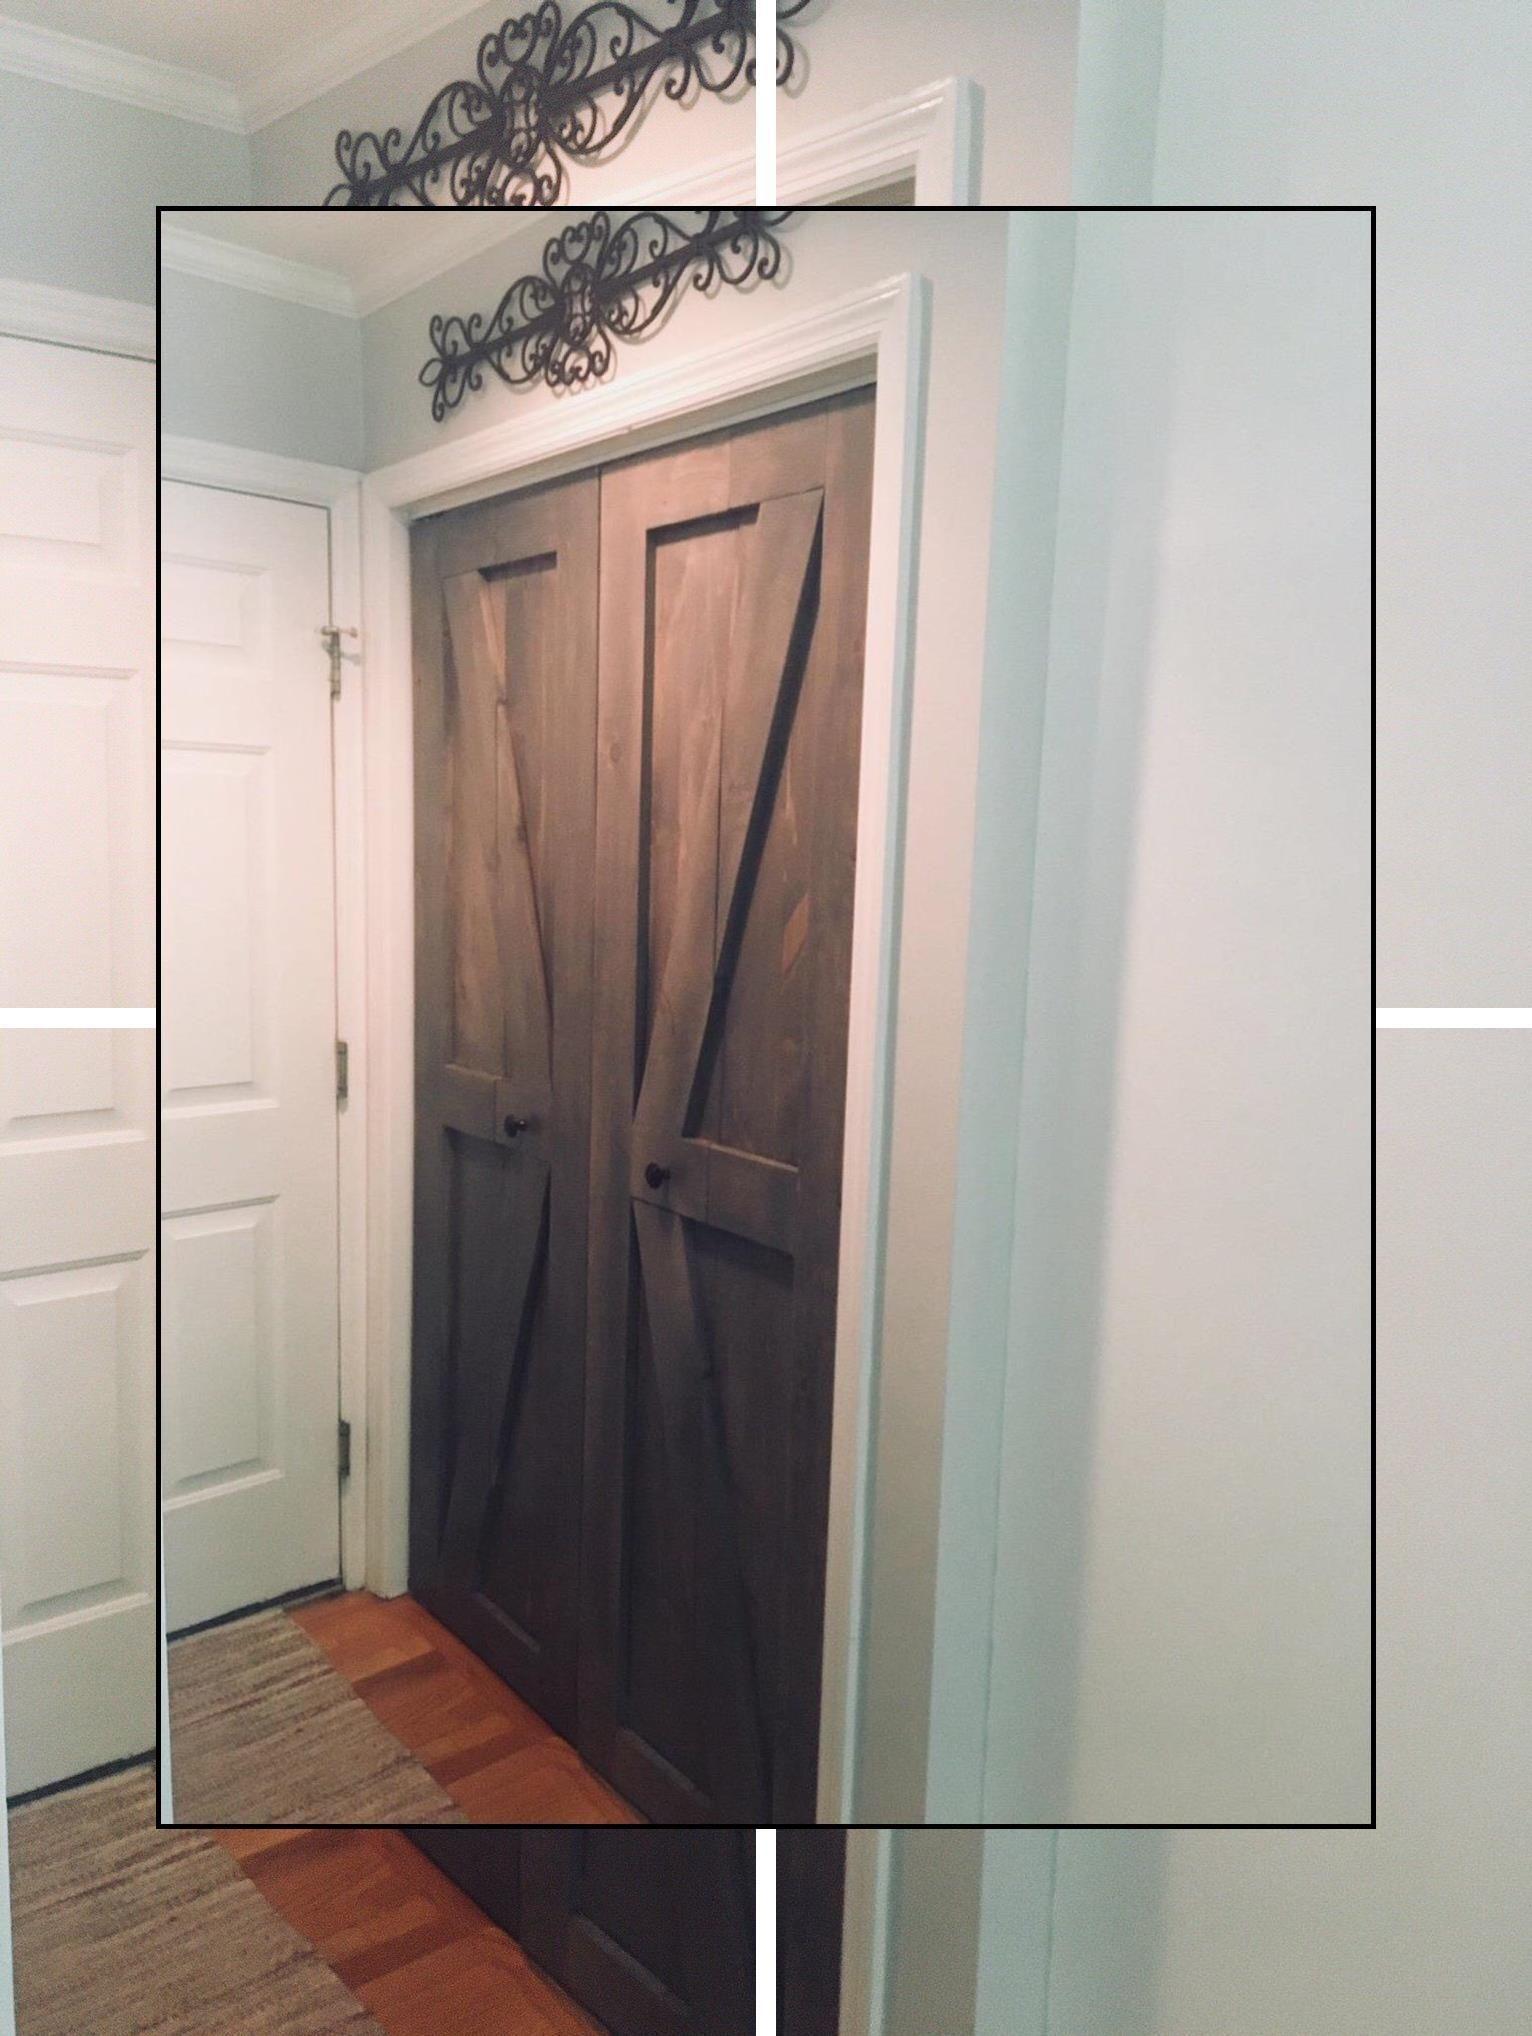 Barn Door Designs Interior Rustic Hardware Barn Doors Best Wood For Barn Door In 2020 Barn Doors Sliding Wood Doors Interior Barn Doors For Sale